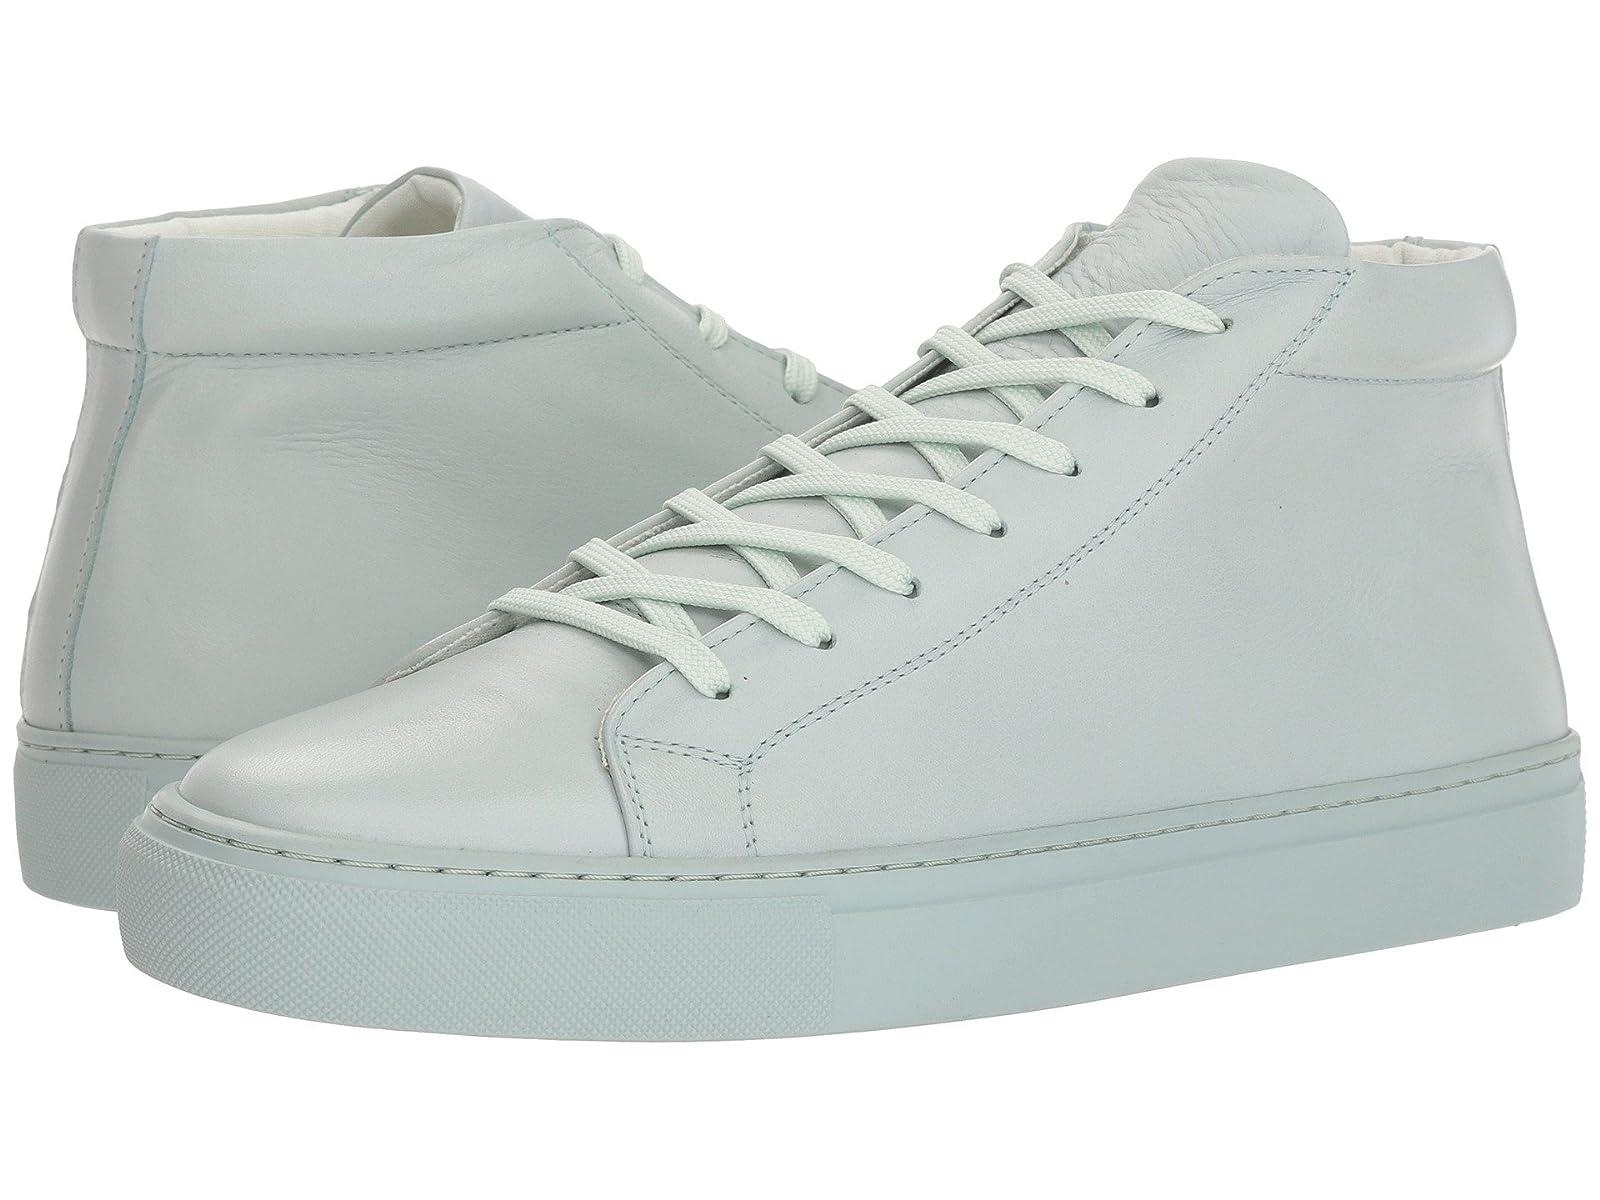 Supply Lab LexingtonAtmospheric grades have affordable shoes